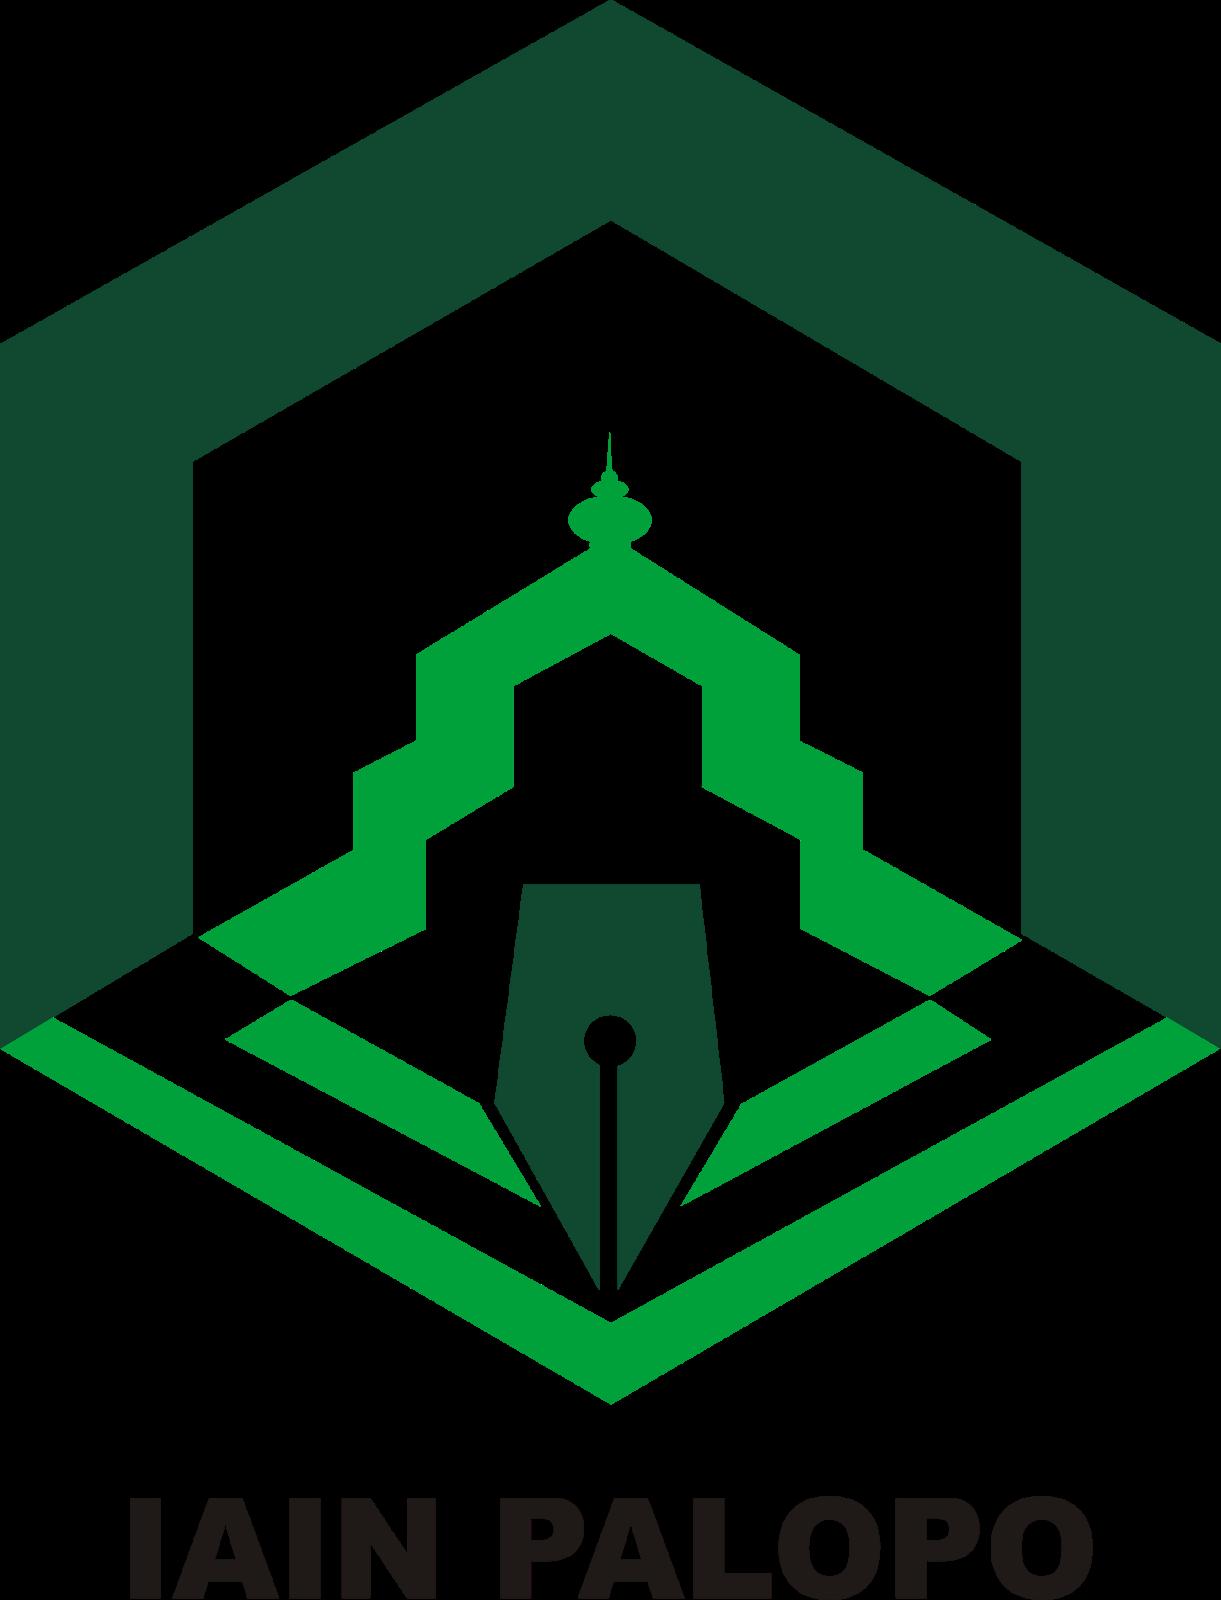 Logo Institut Agama Islam Negeri (IAIN) Palopo - Logo Lambang Indonesia